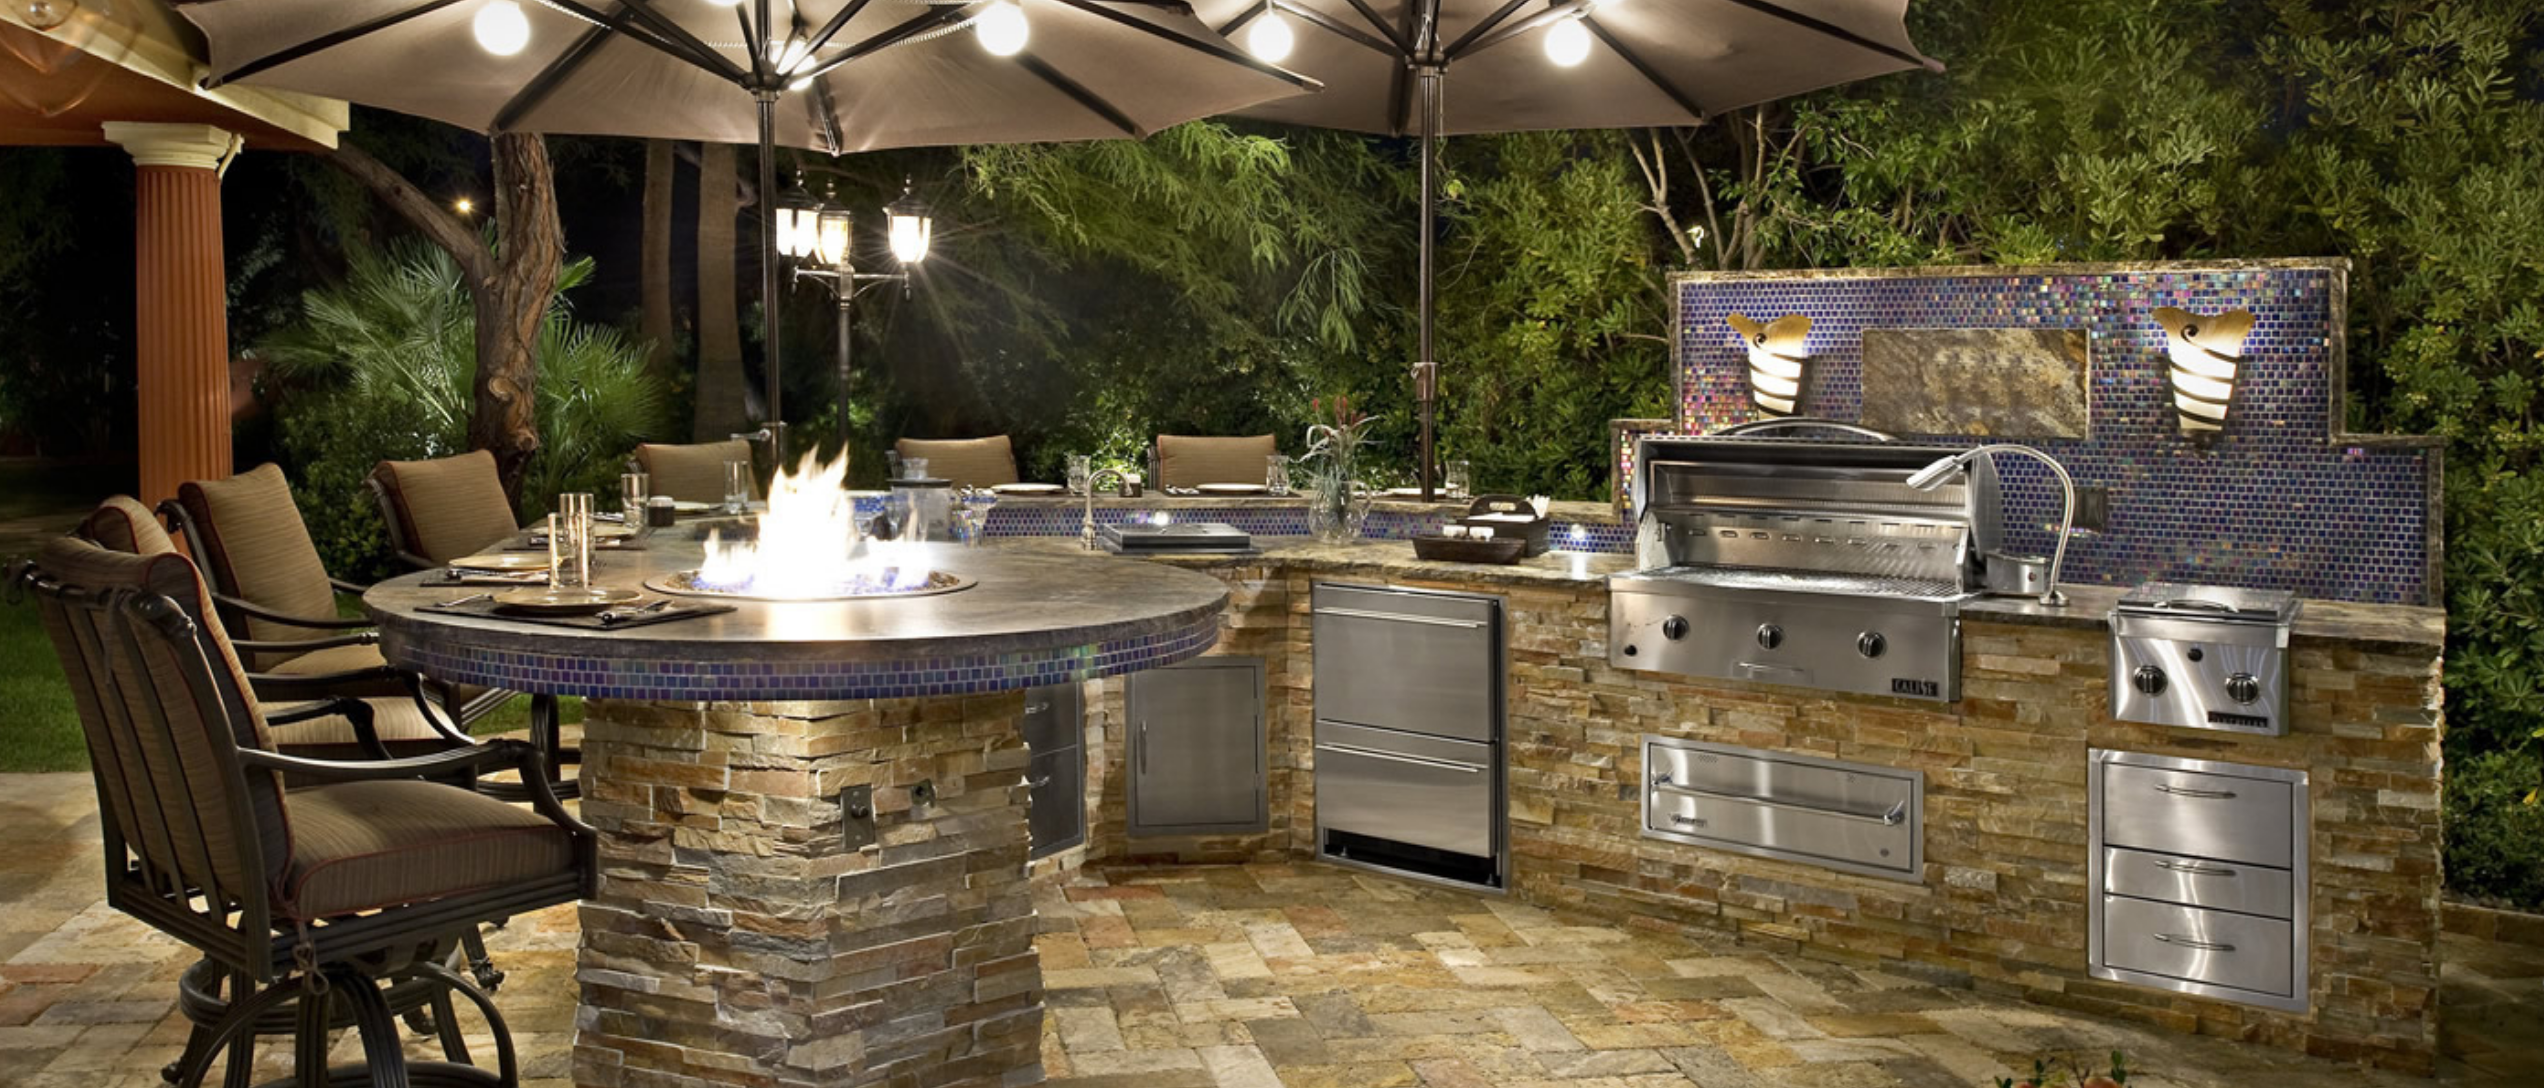 LA's Custom Outdoor Kitchens